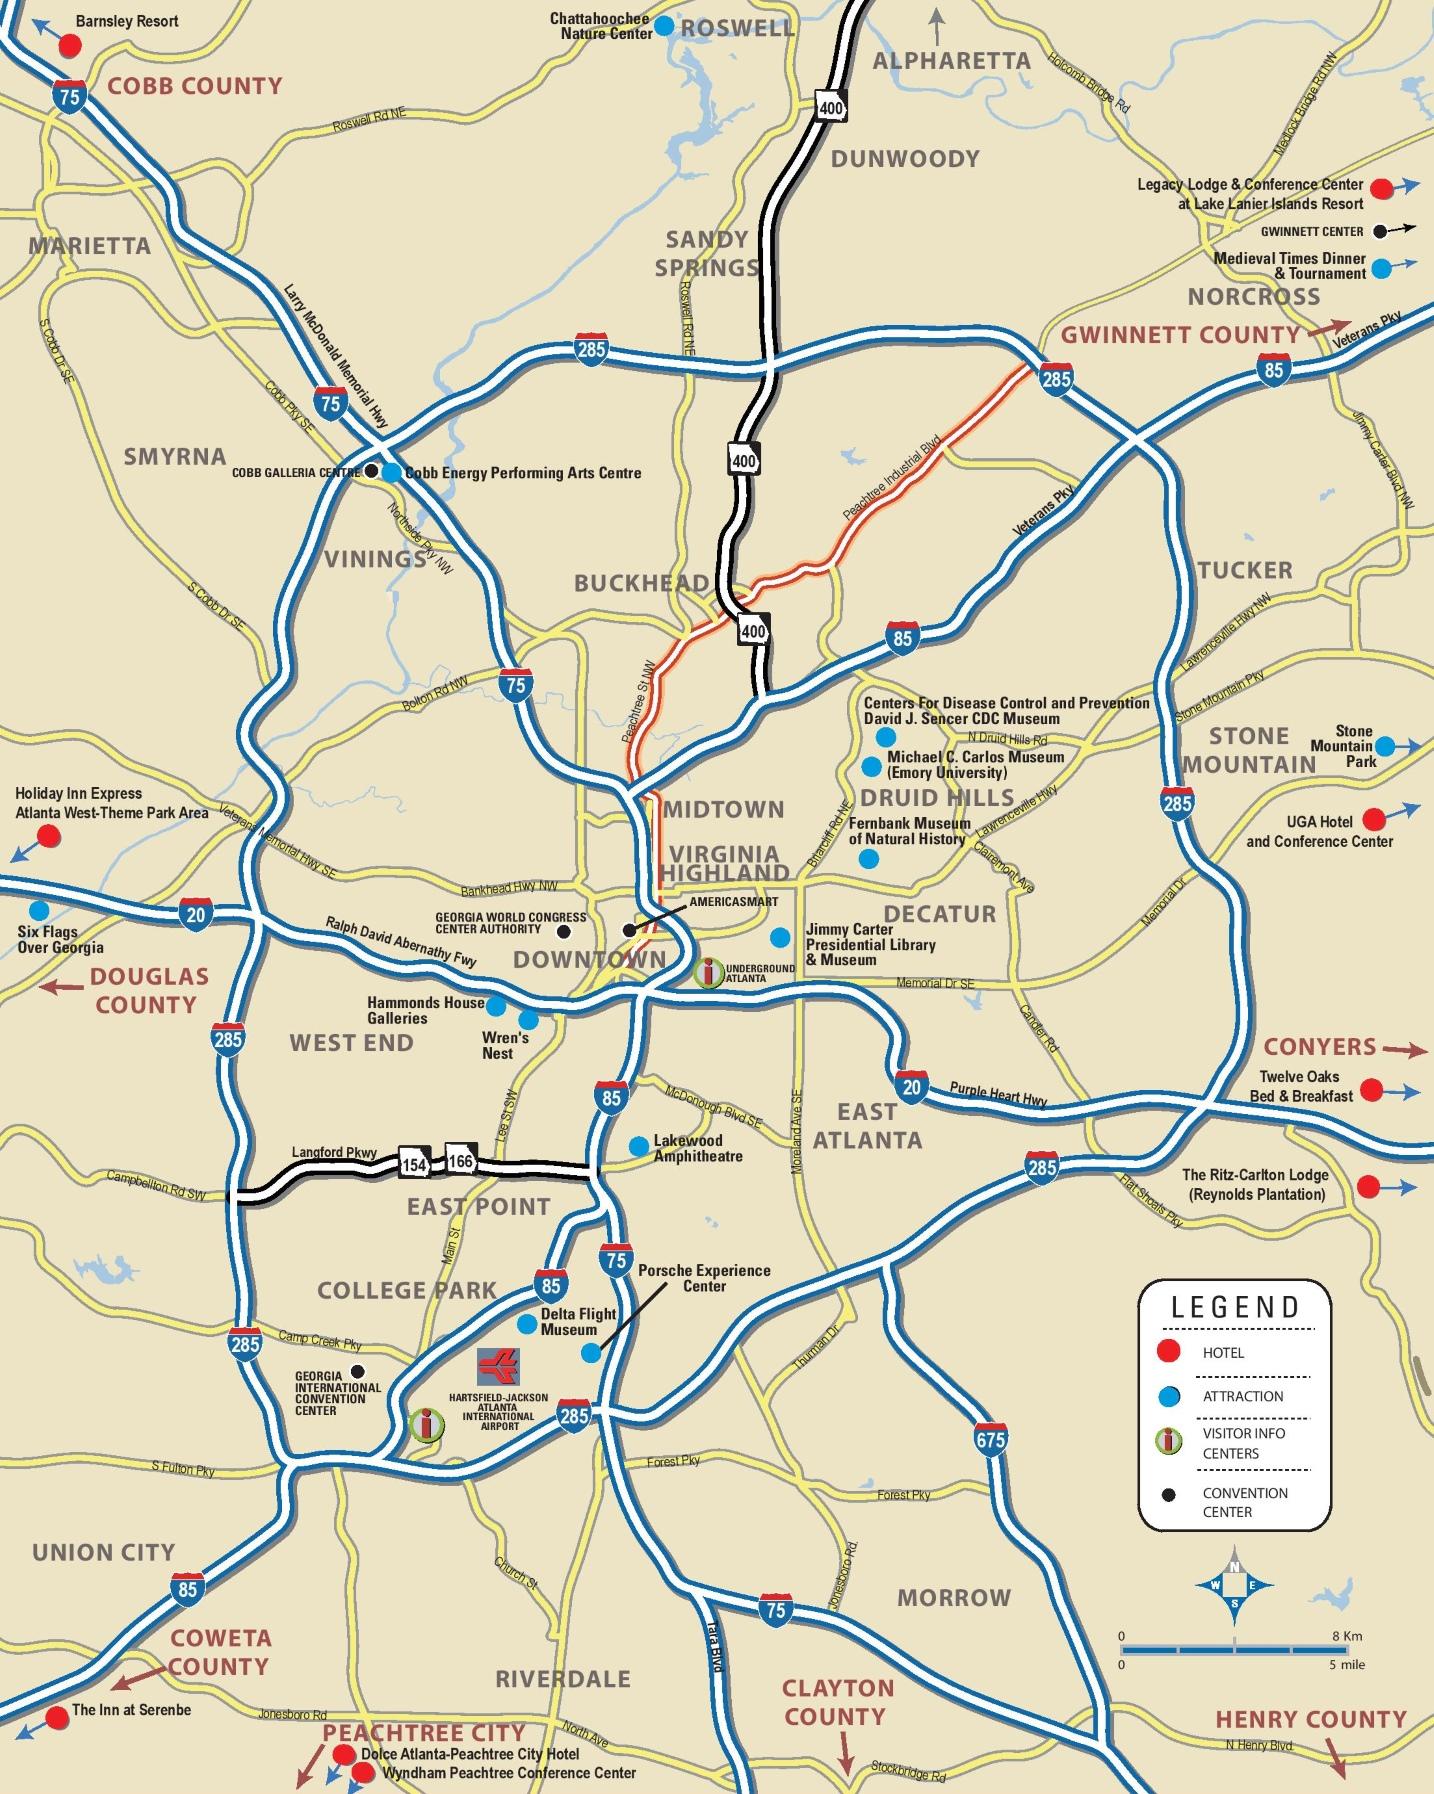 Map Of Atlanta Area Atlanta area map